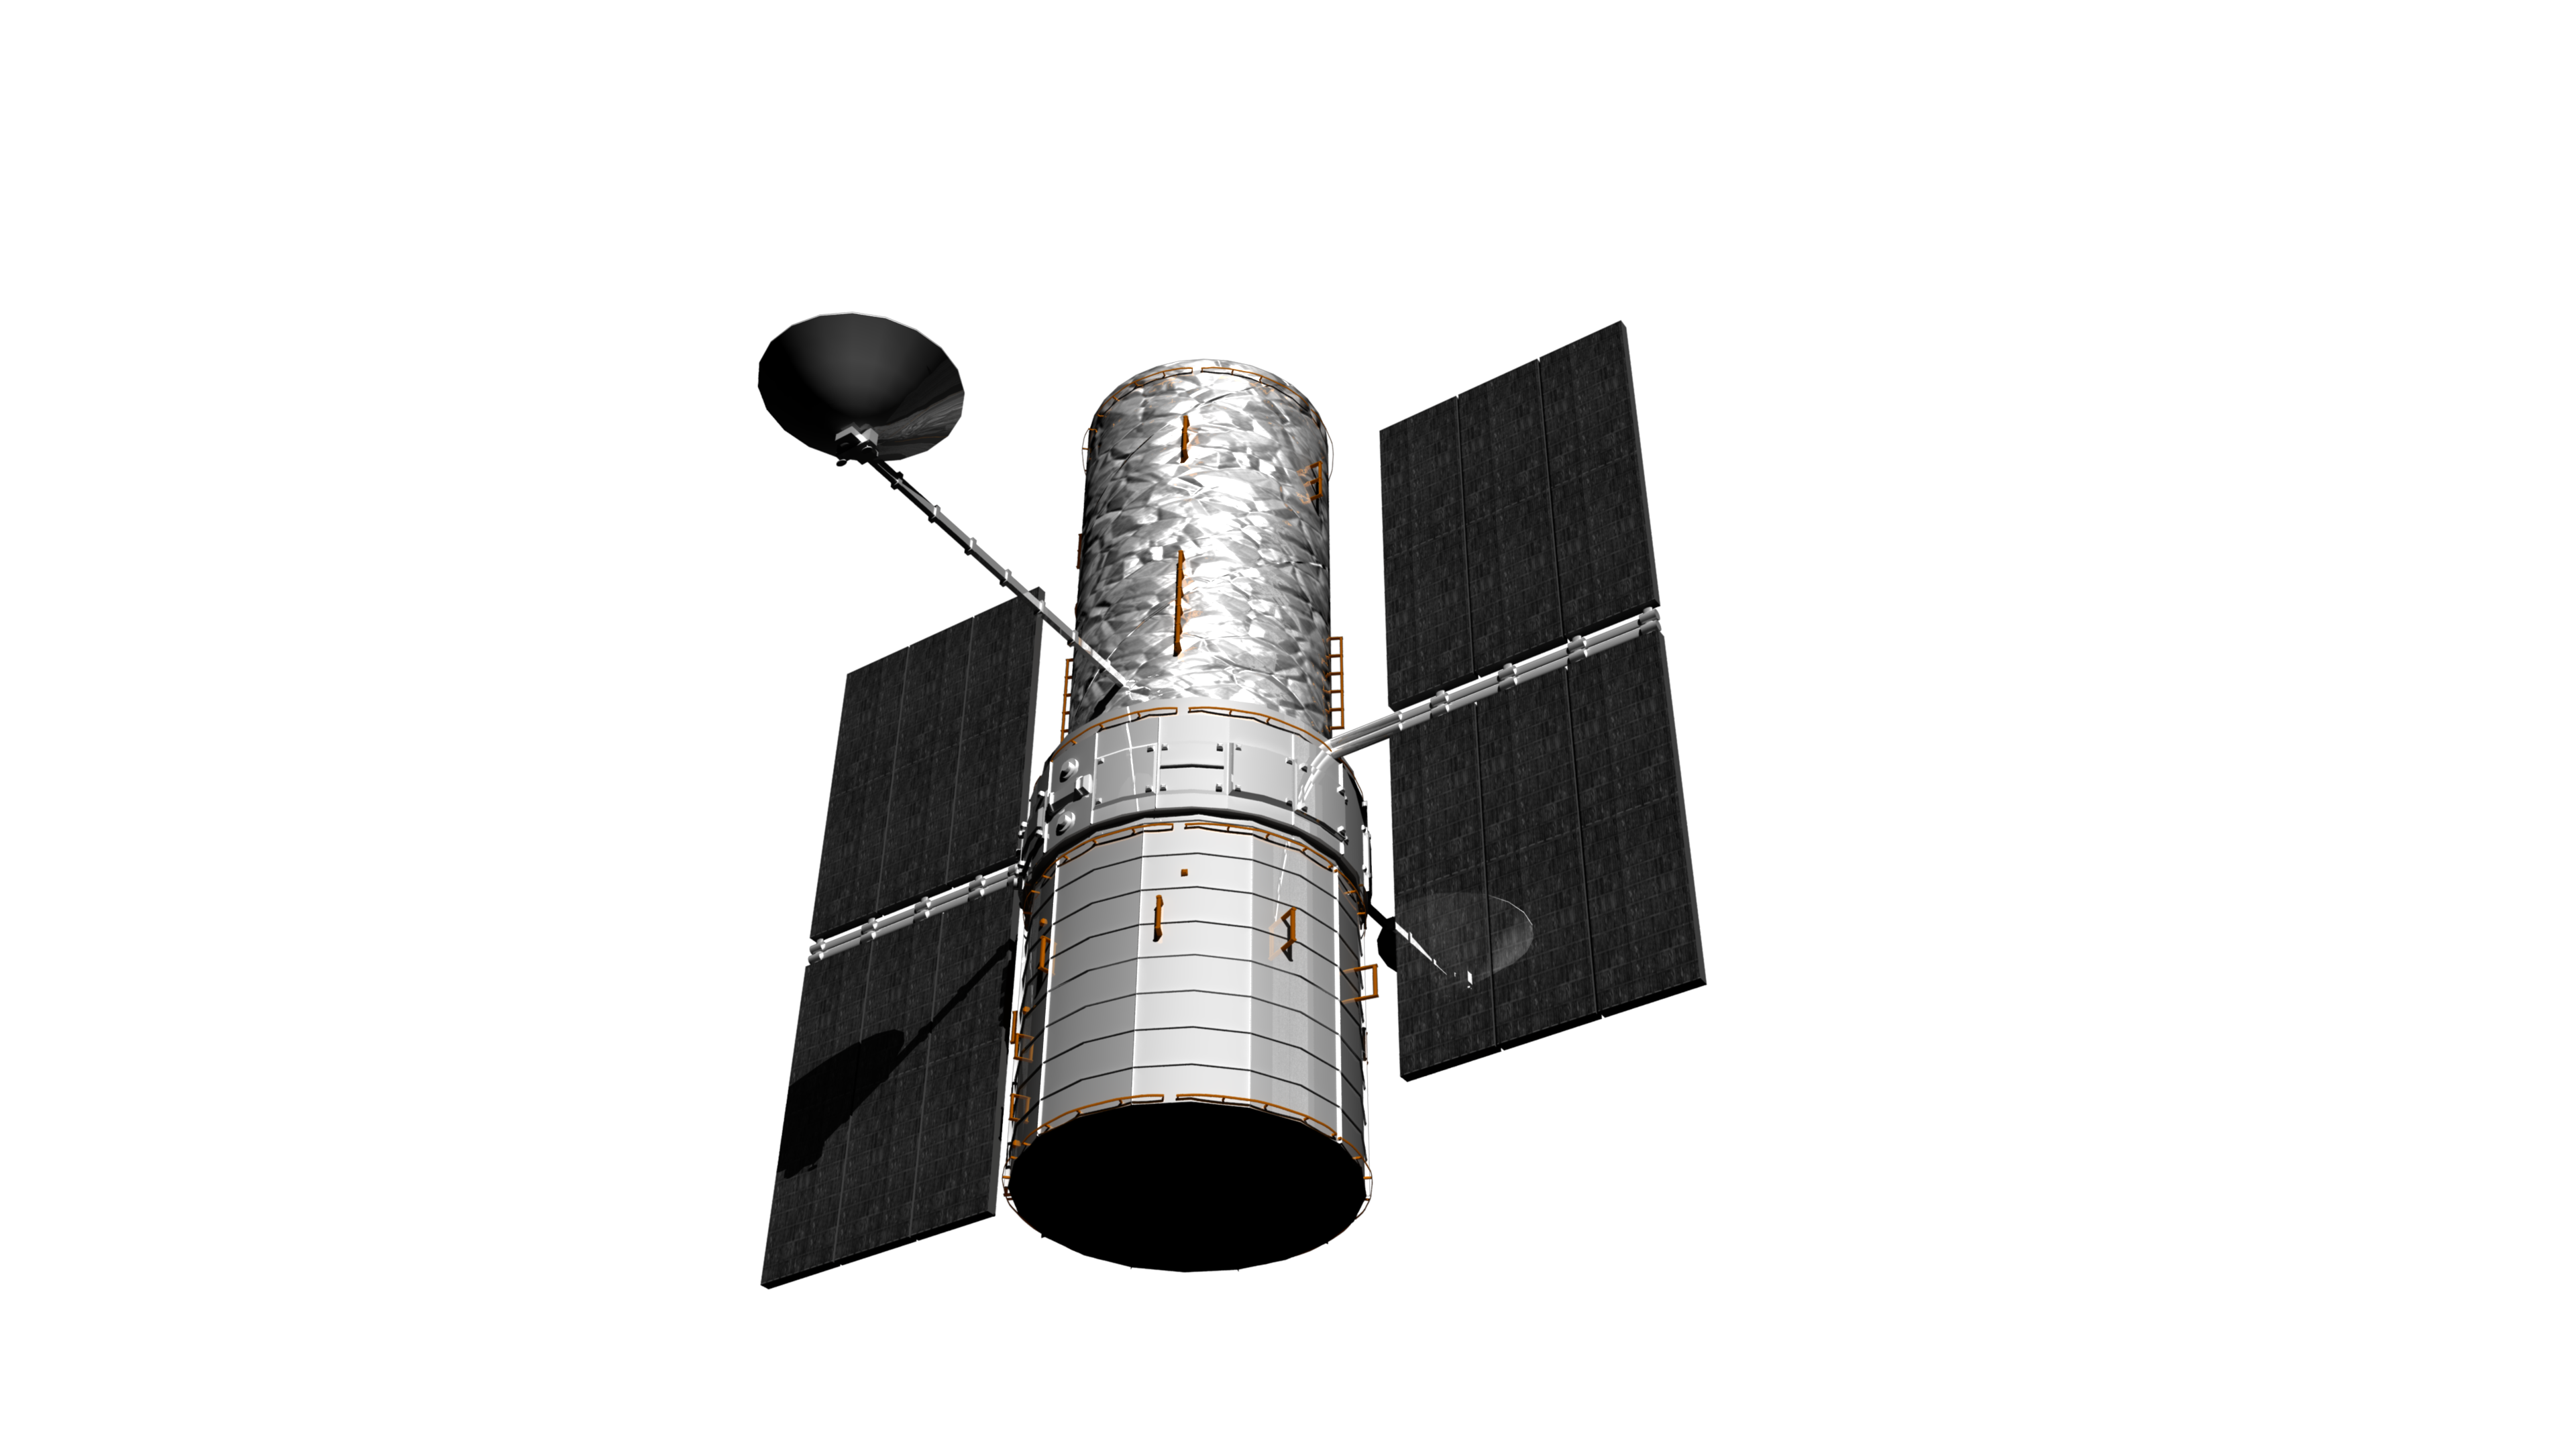 Hubble 4k